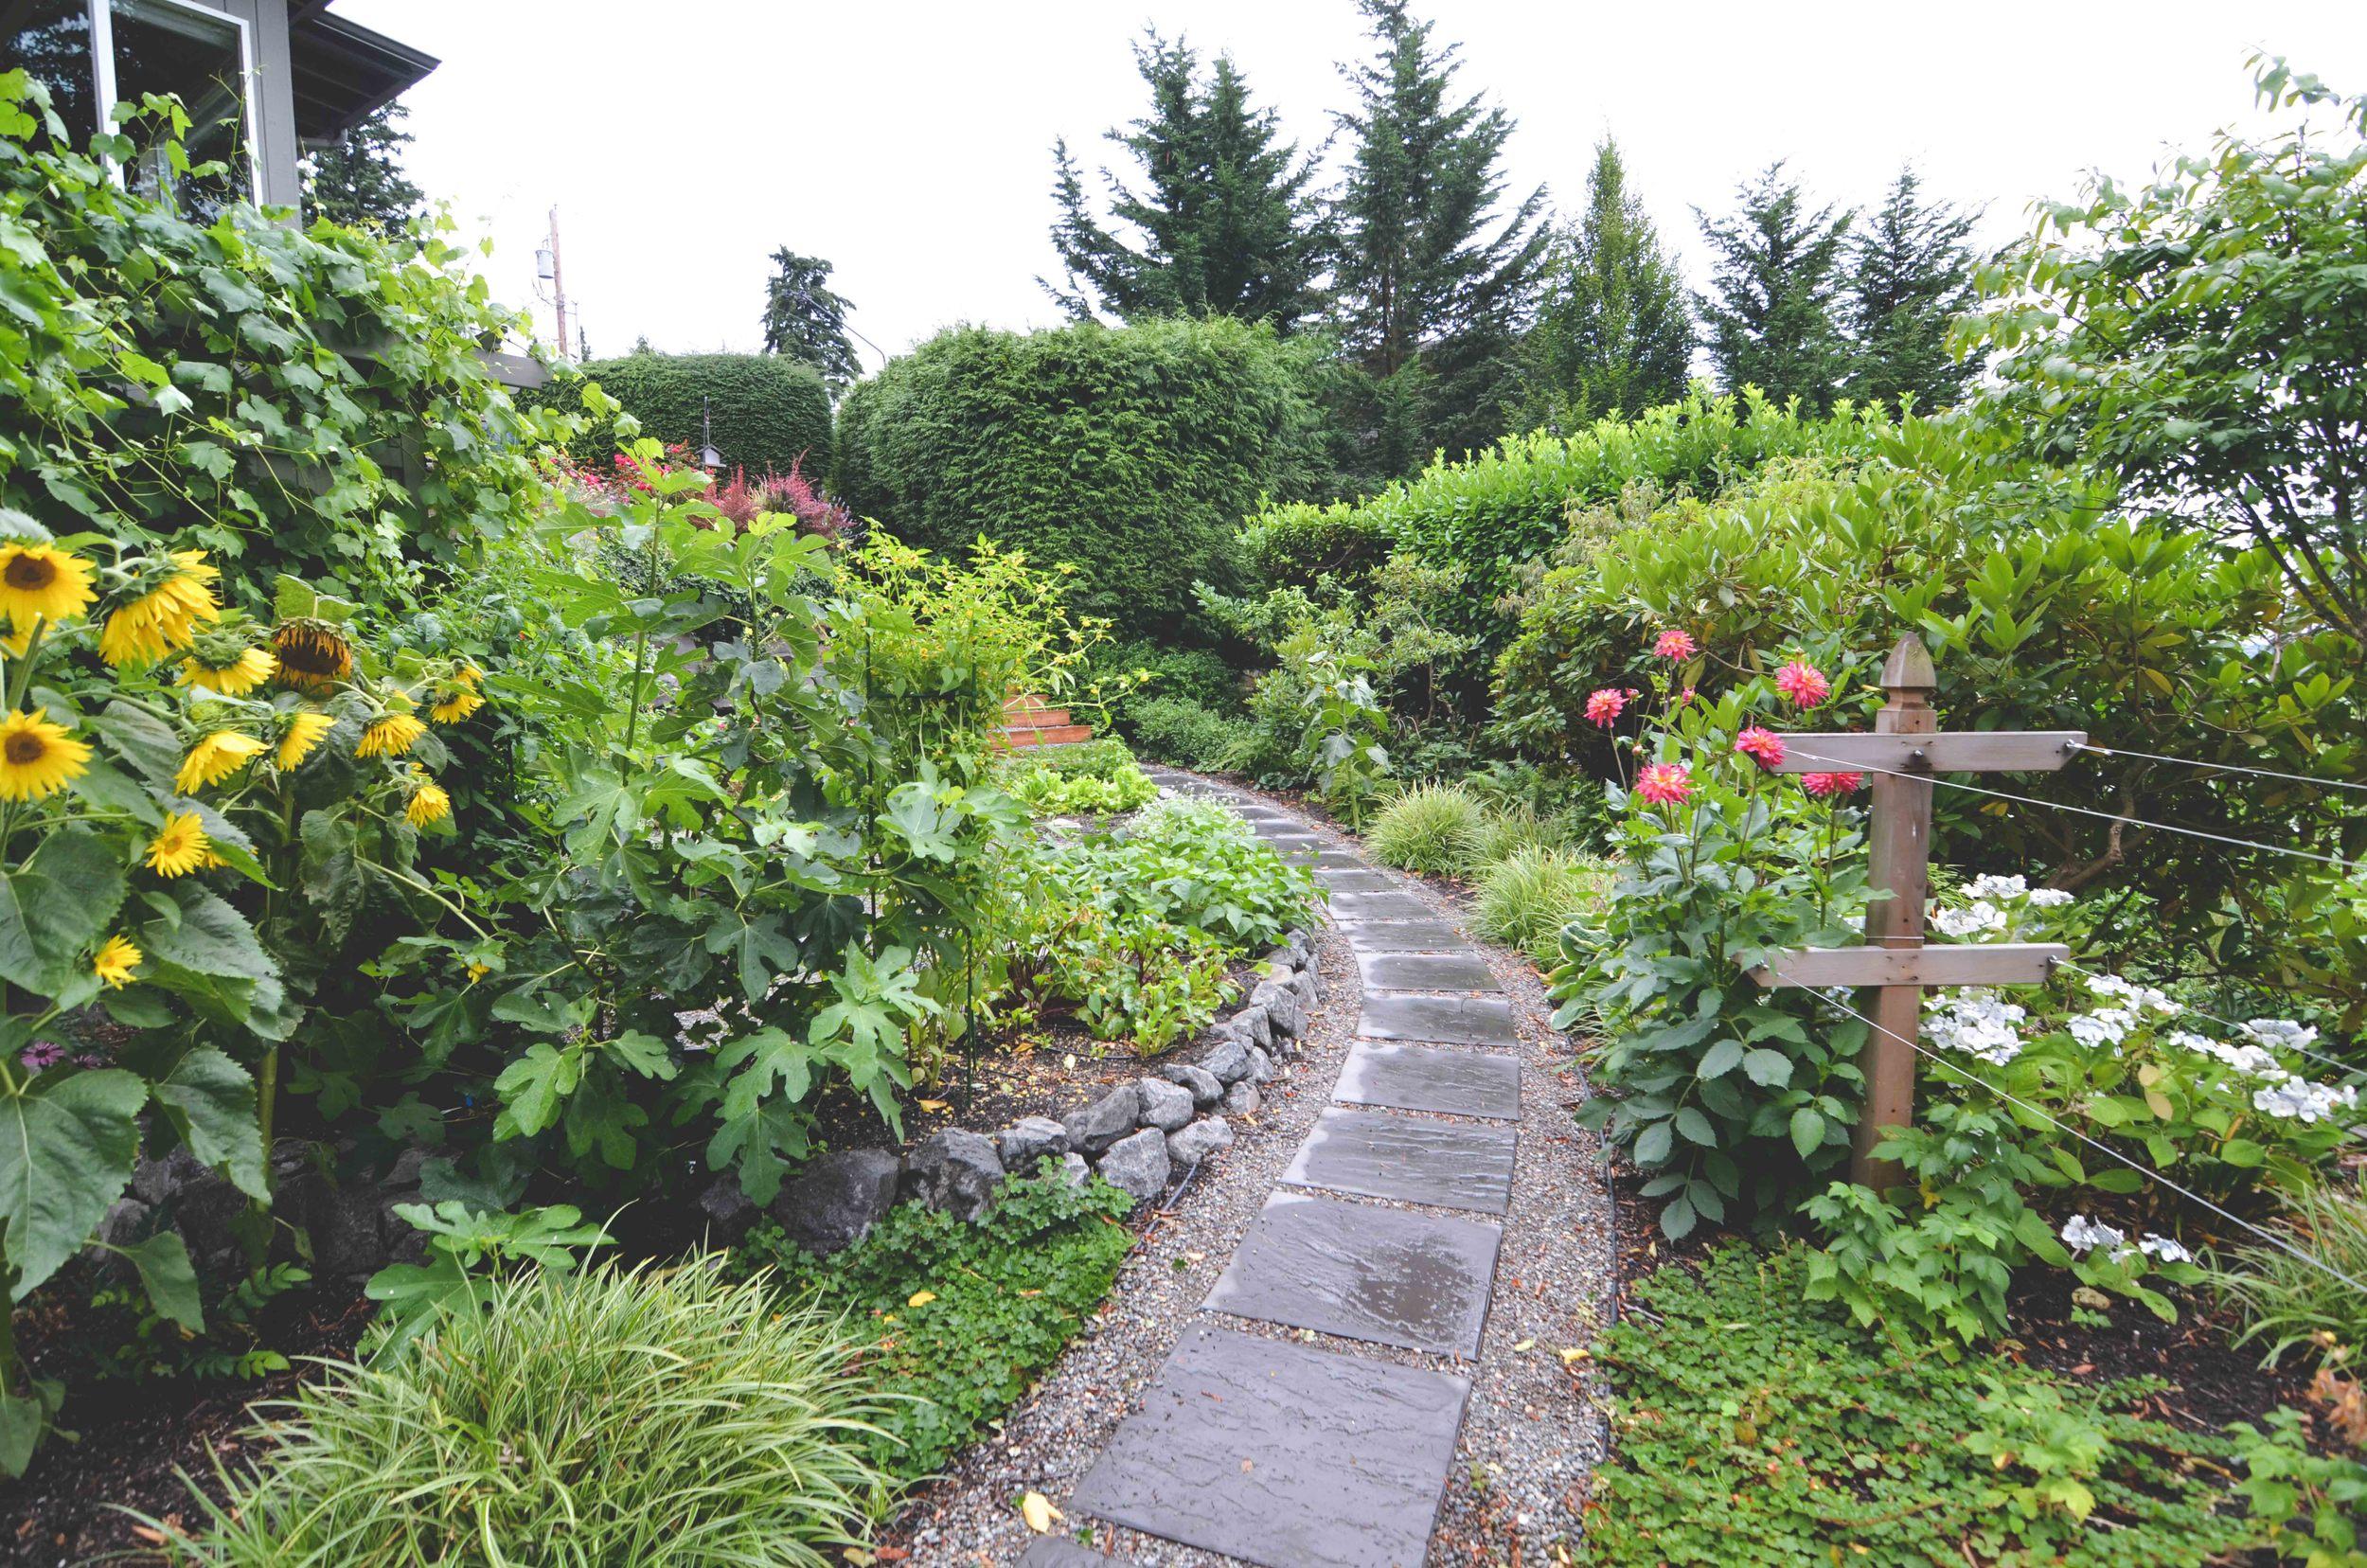 Mercer Island Vegetable Garden & Landscape Design_Seattle Urban Farm Company